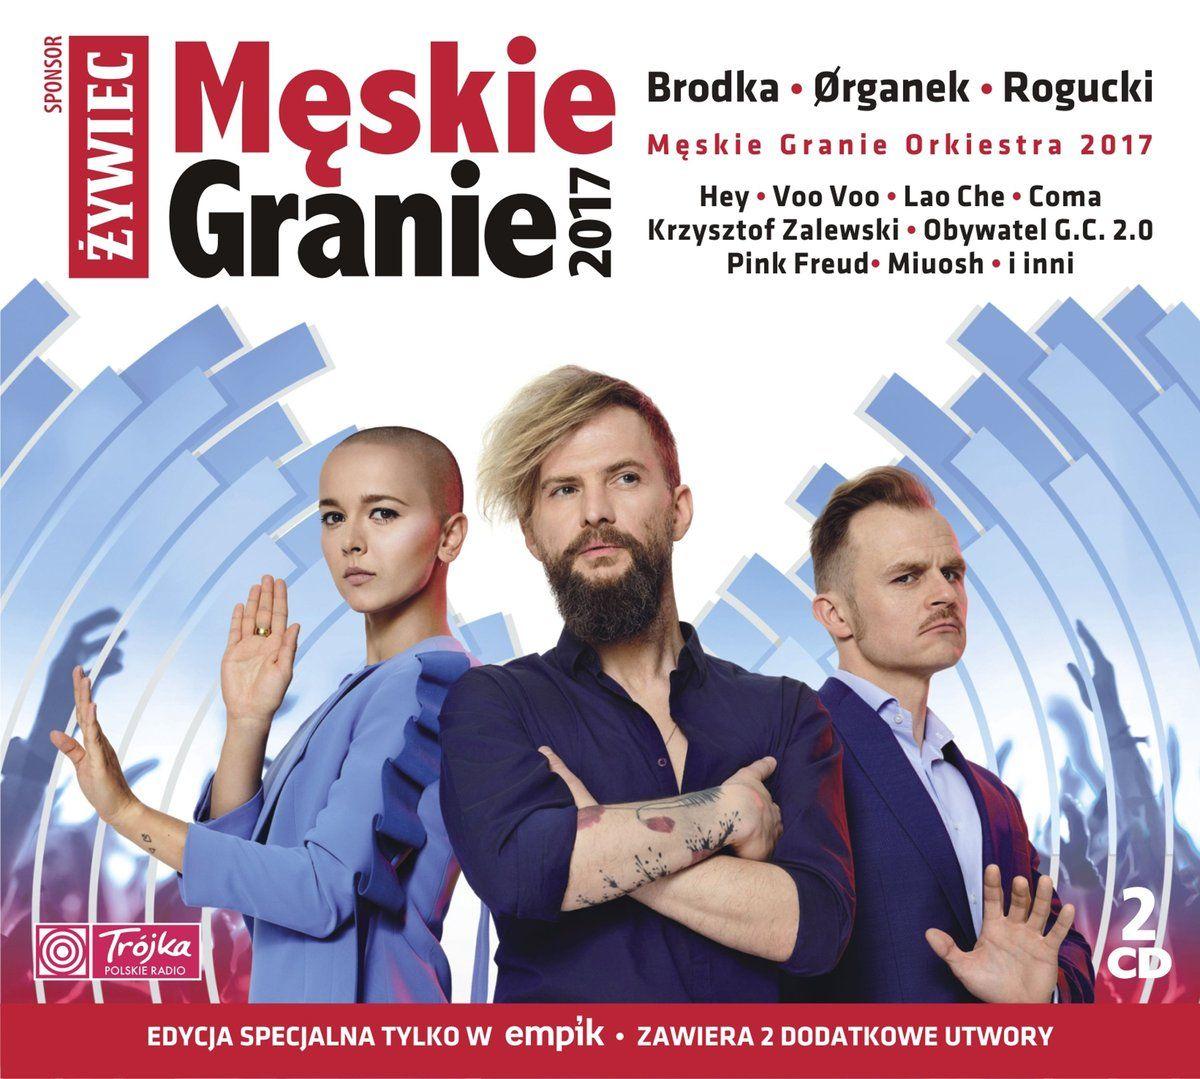 Various Artists - Męskie Granie 2017 album cover